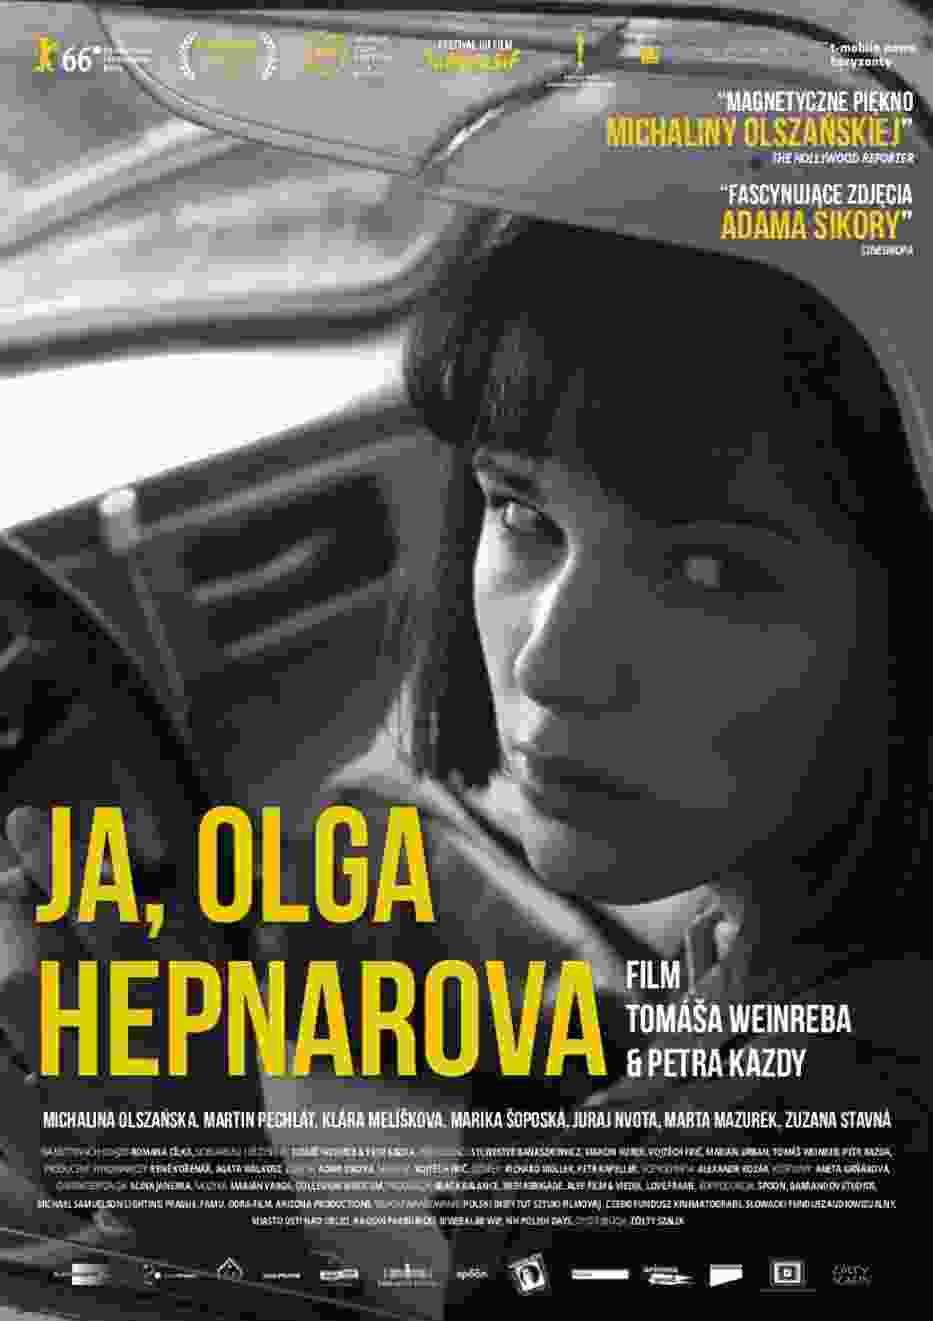 Ja, Olga Hepnarova doceniony prestiżową nagrodą